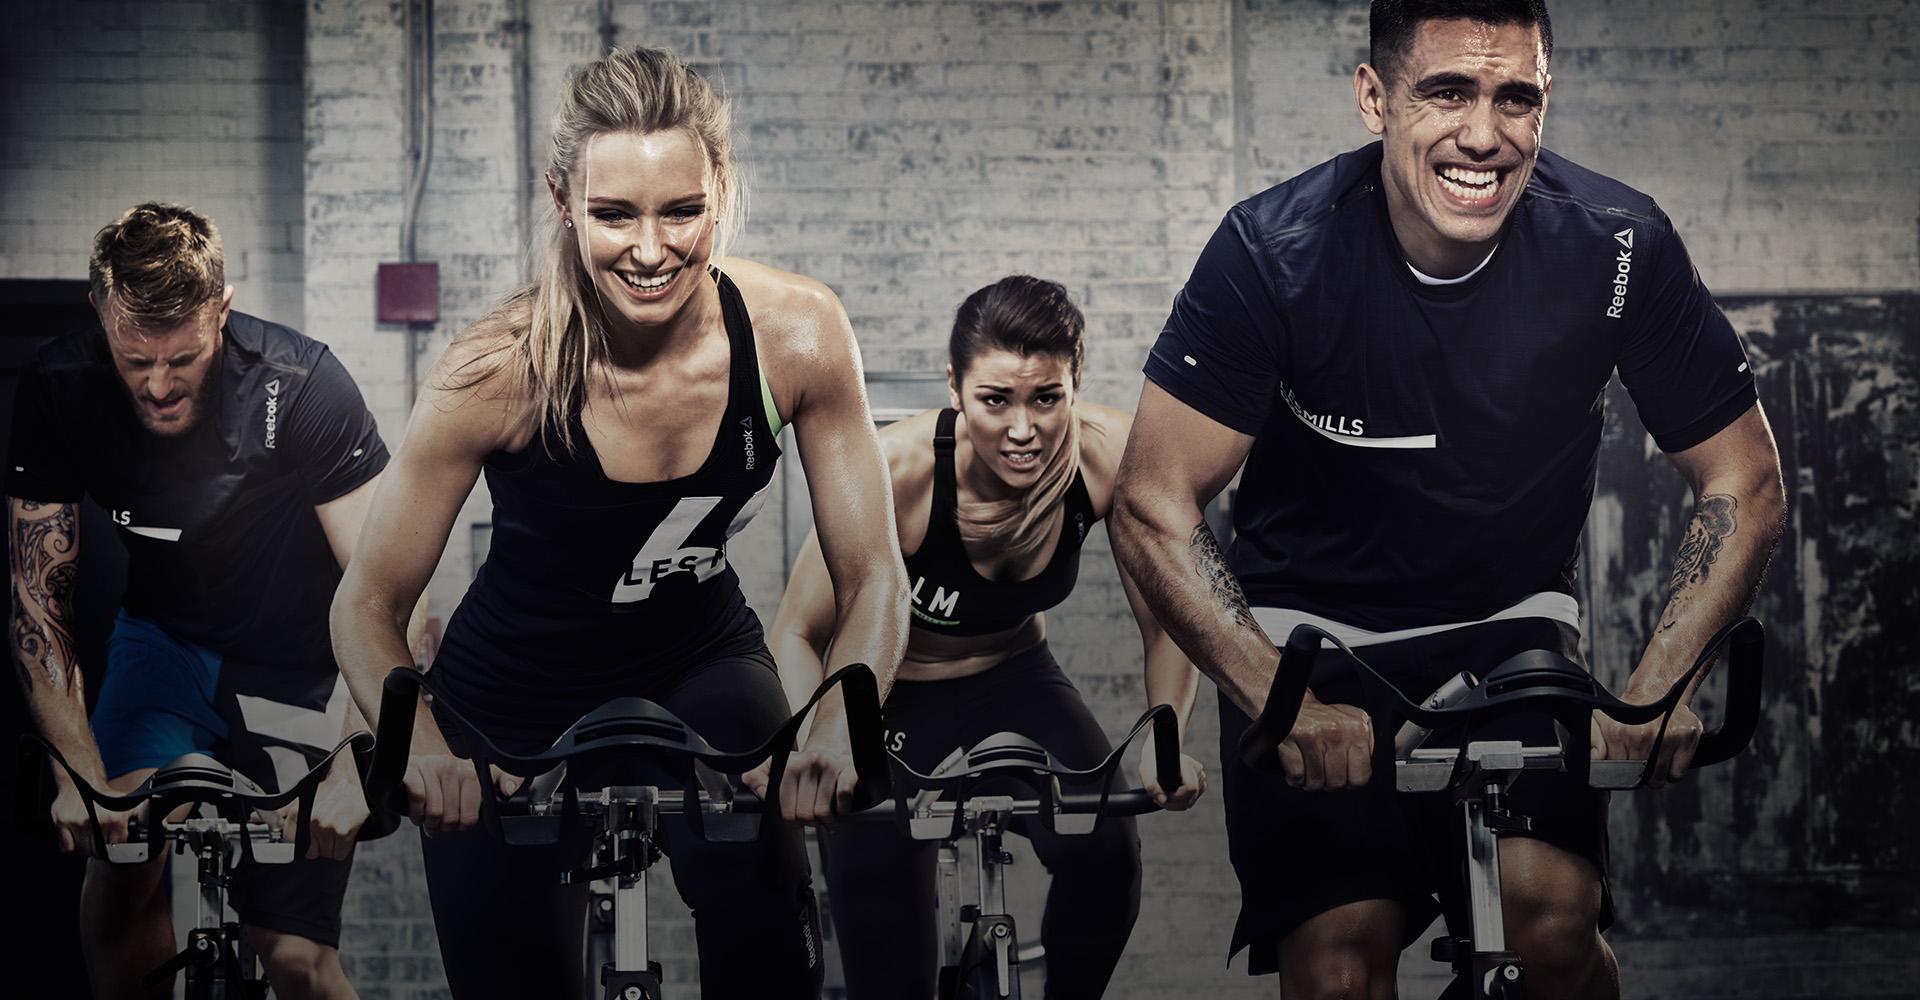 spinning_support_sport_yoga_groep_training_fitness_health_club_landgraaf_landgraaf_google_heerlen_geleen_sporten